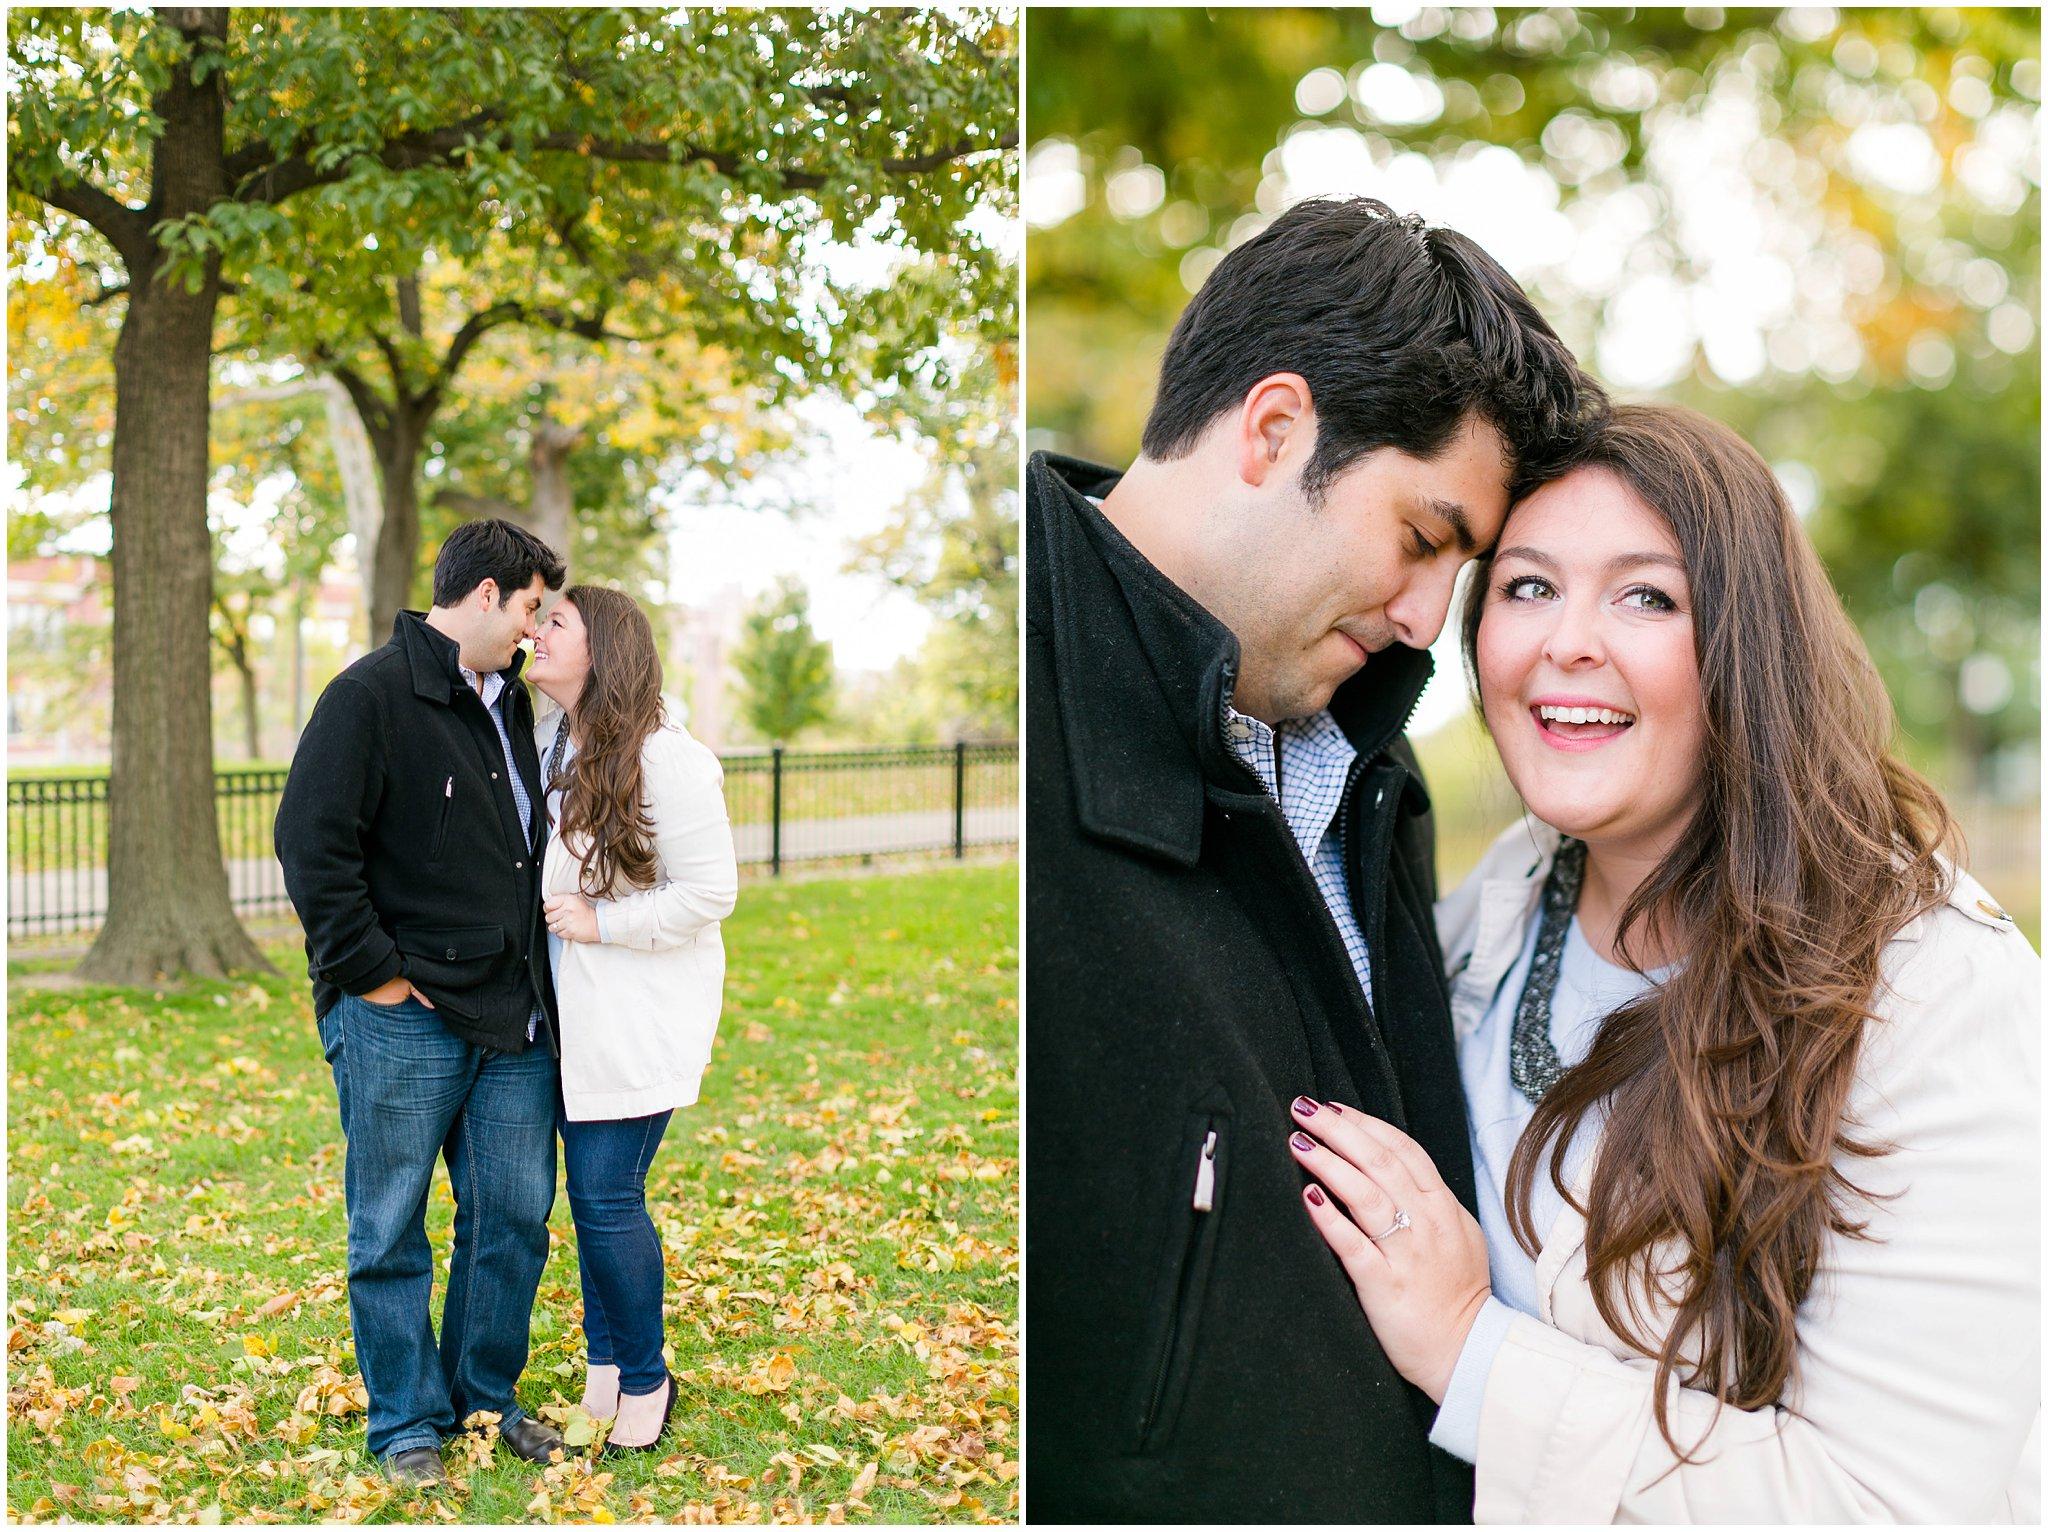 Baltimore Engagement Photos Fells Point Halie & Michael Megan Kelsey Photography-4.jpg